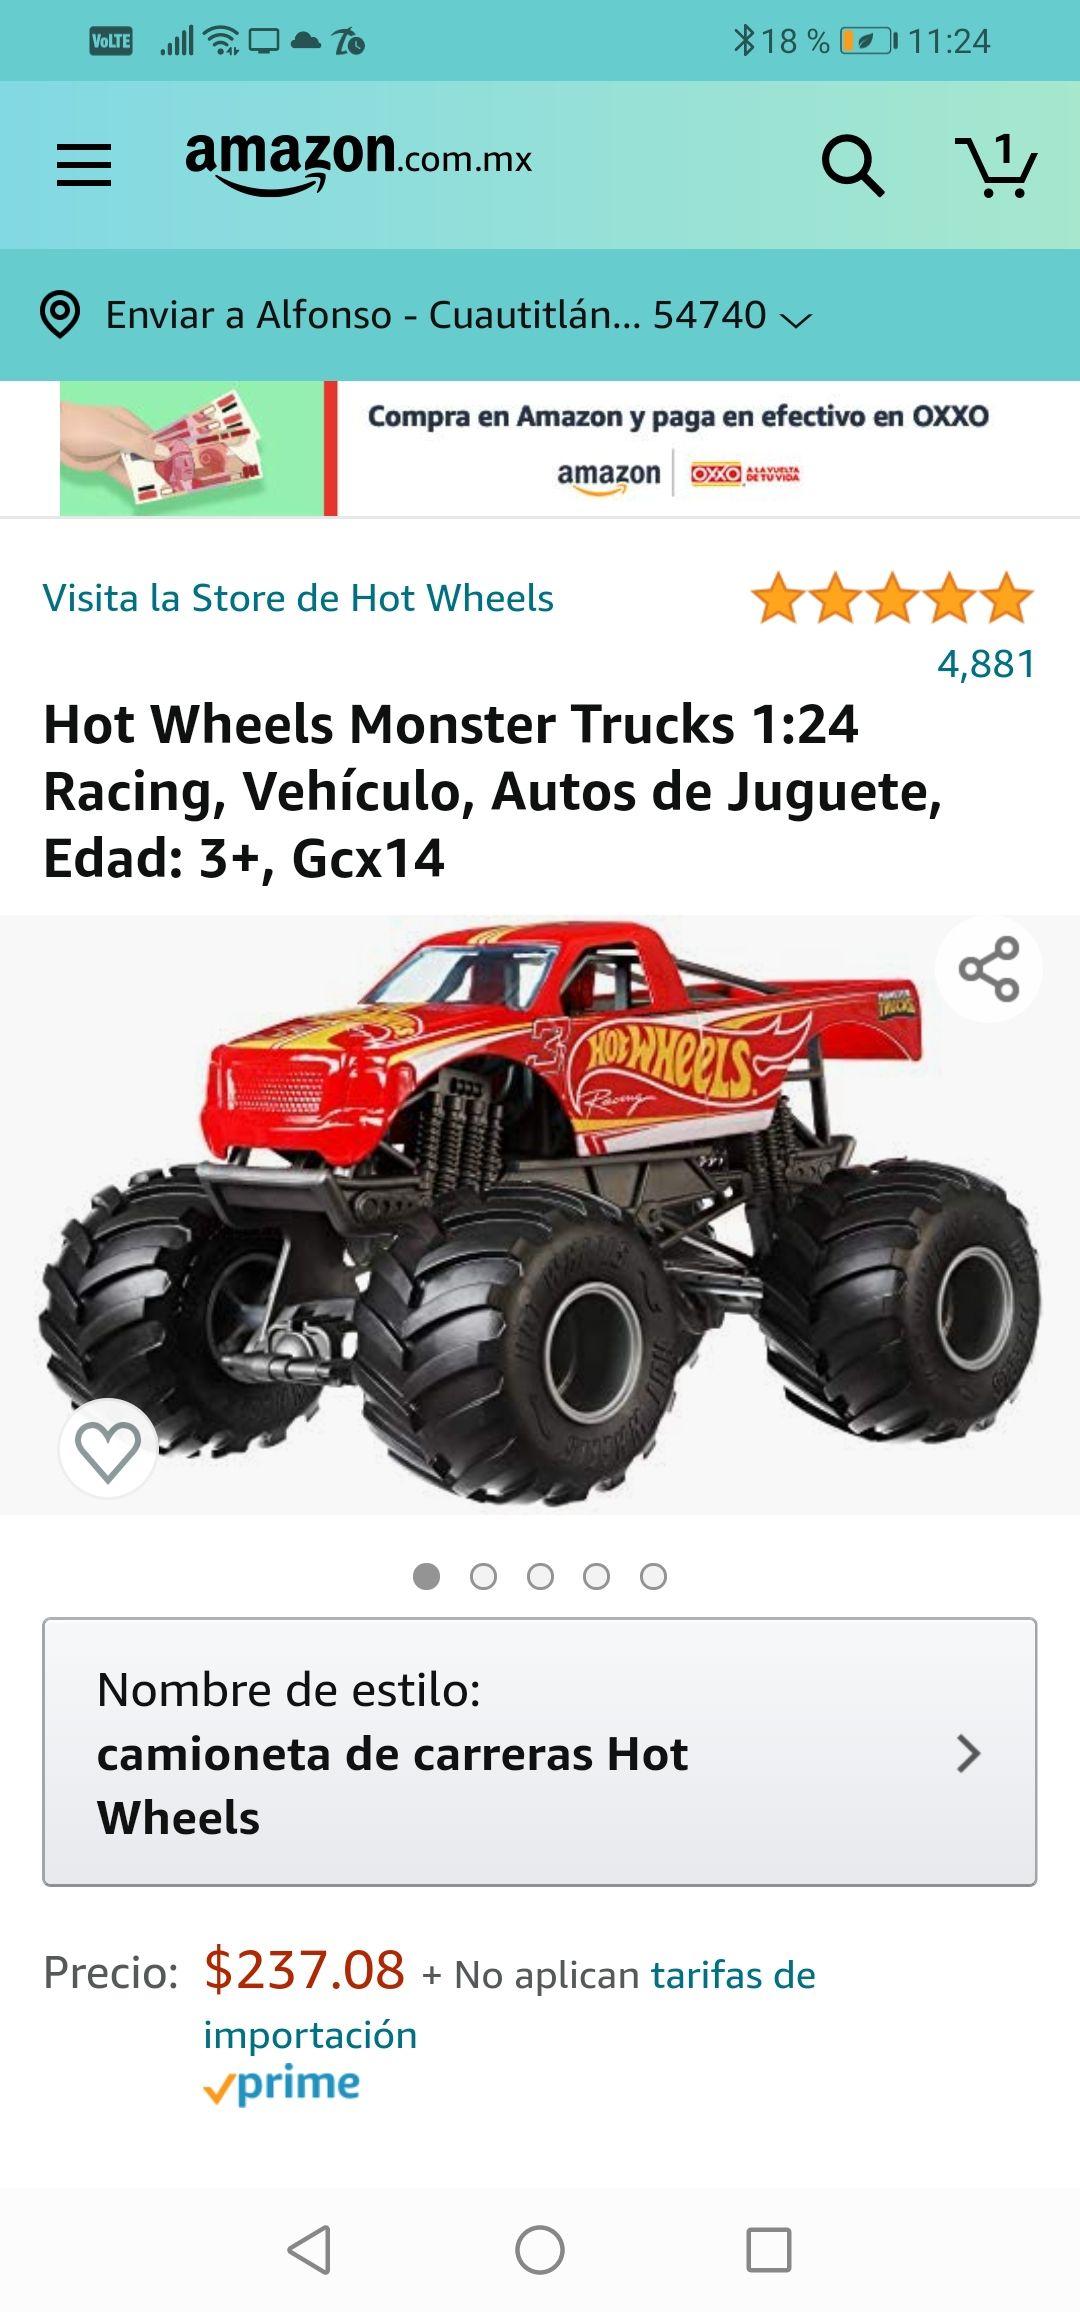 Amazon: Hot Wheels Monster Trucks 1:24